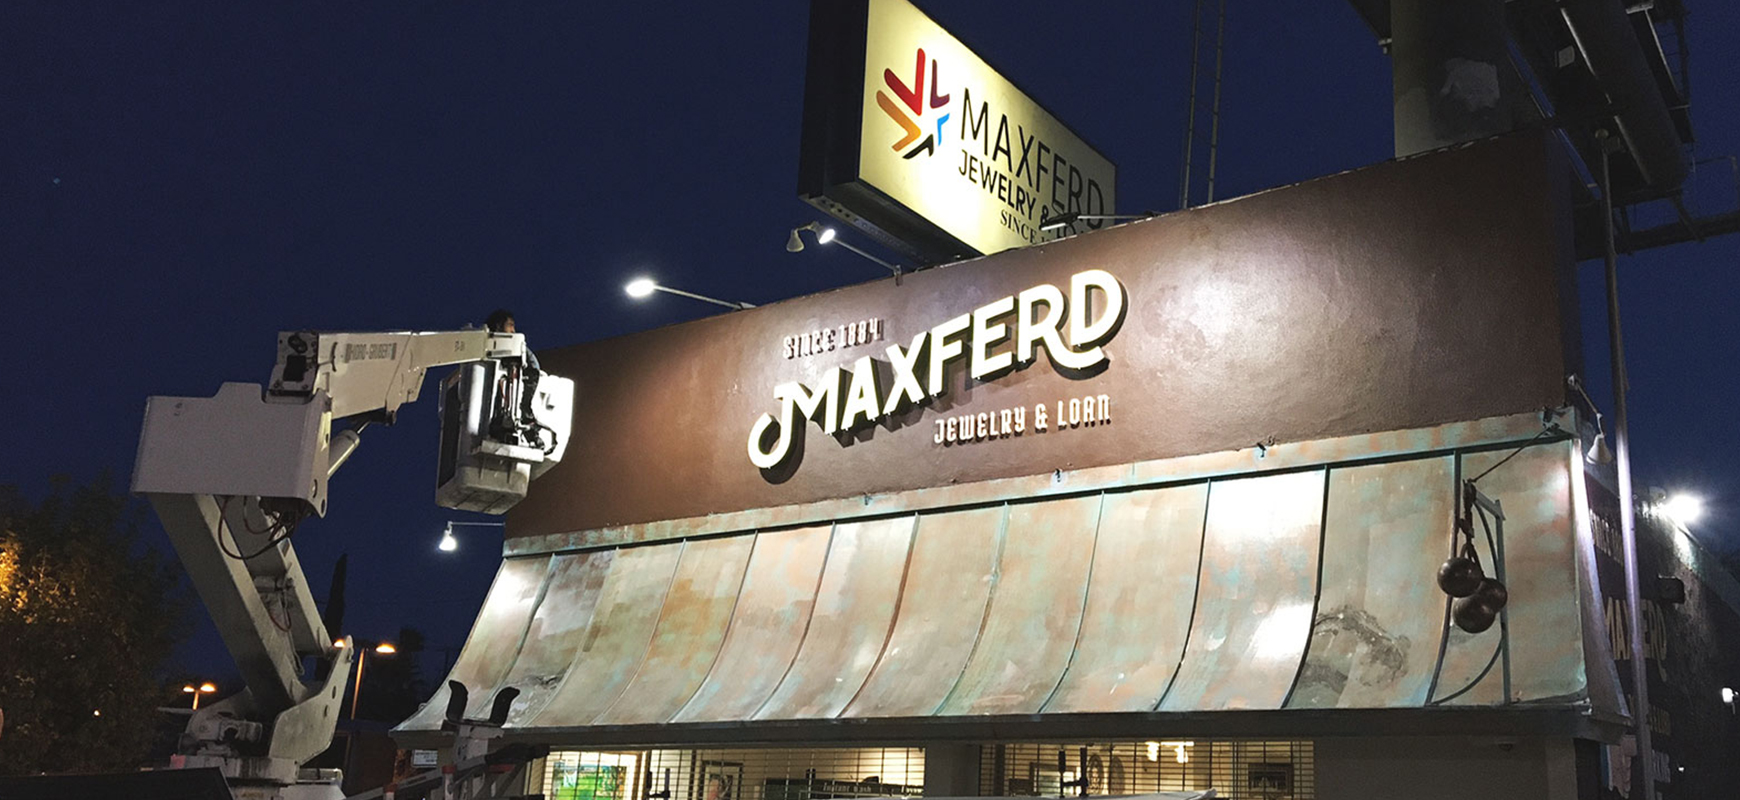 Maxferd architectural sign installation process